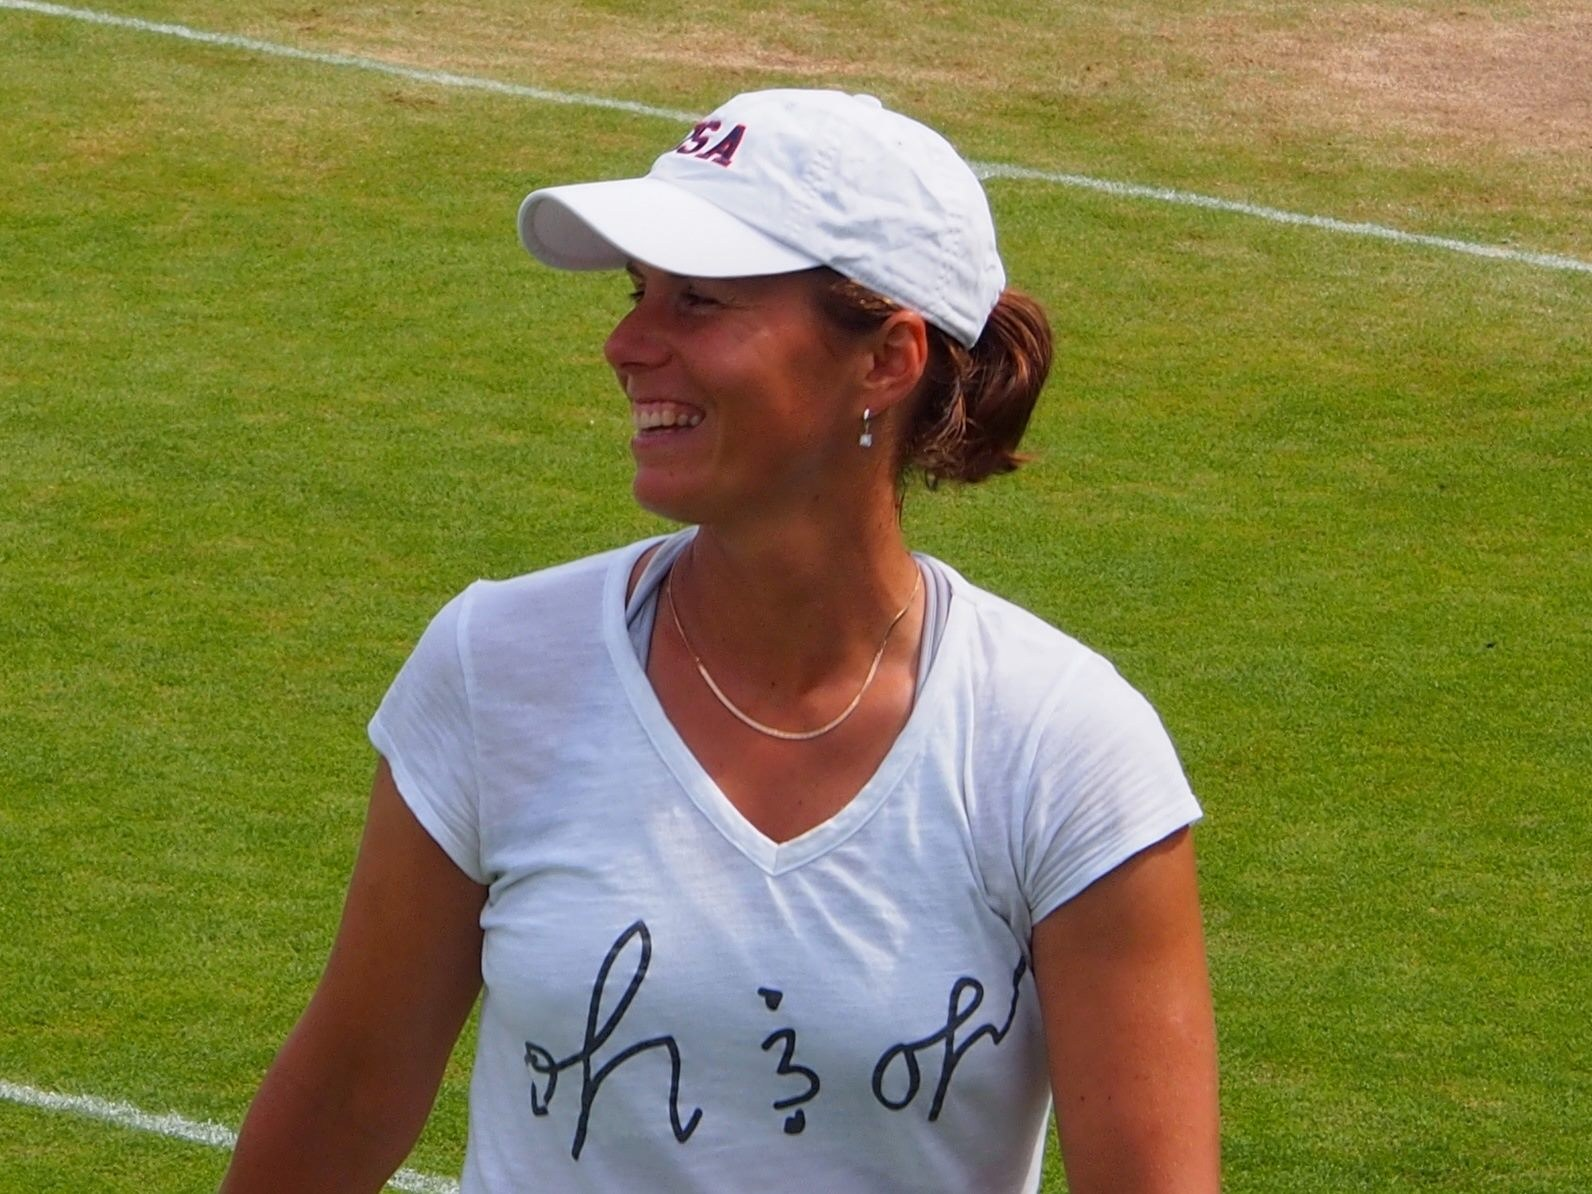 Тошкентлик теннисчи қиз Серена Уильямсни инграшга мажбур этди